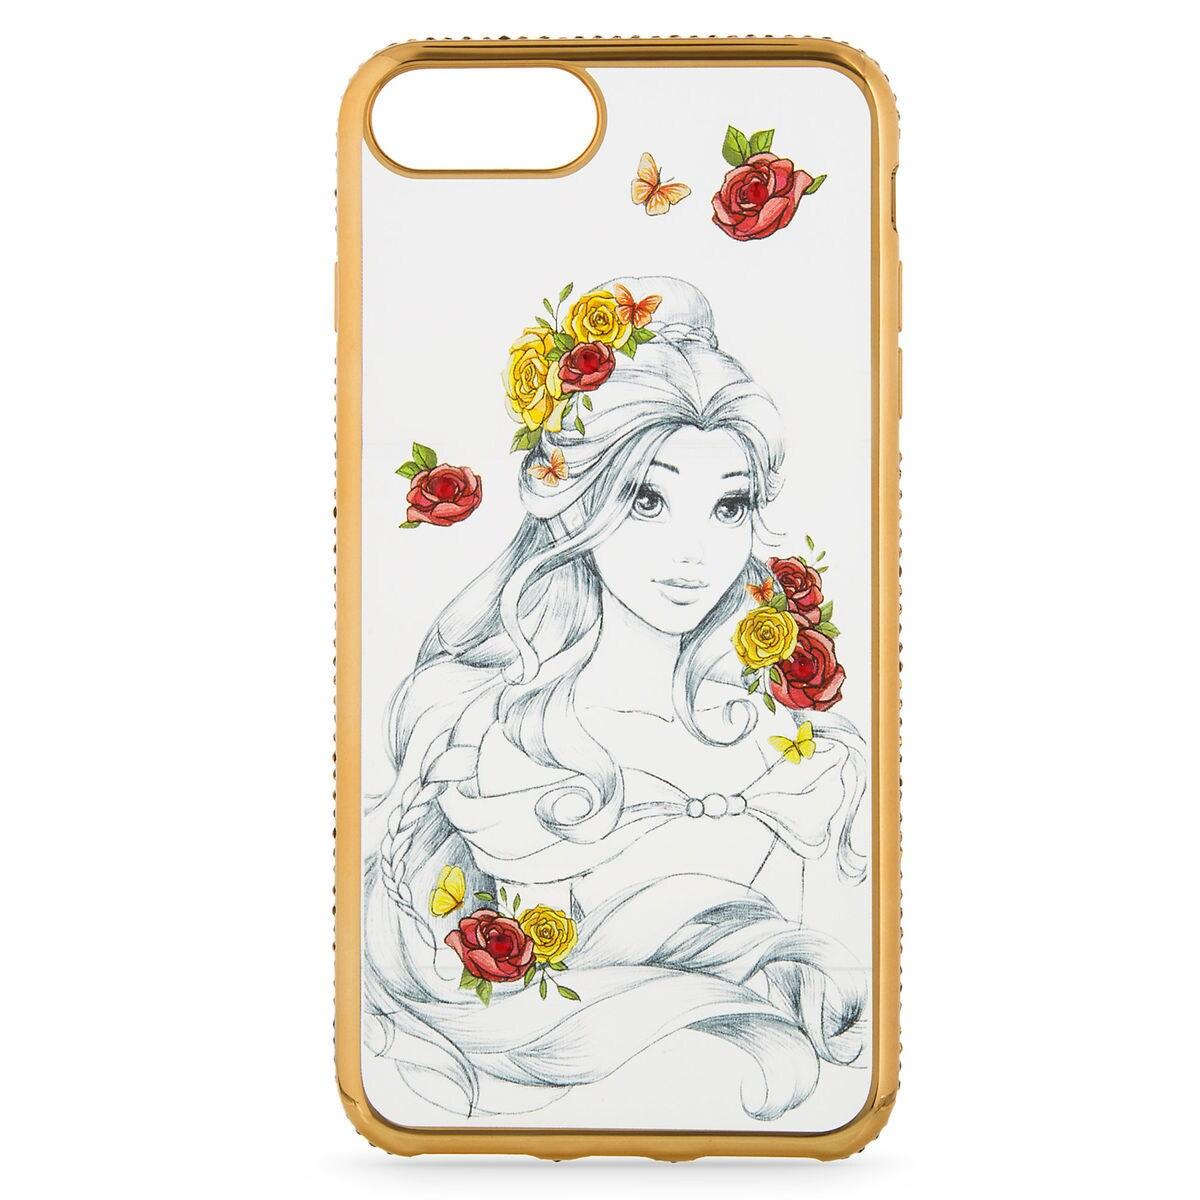 Belle Sketch iPhone 7 Plus/6 Plus/6S Plus Case | shopDisney